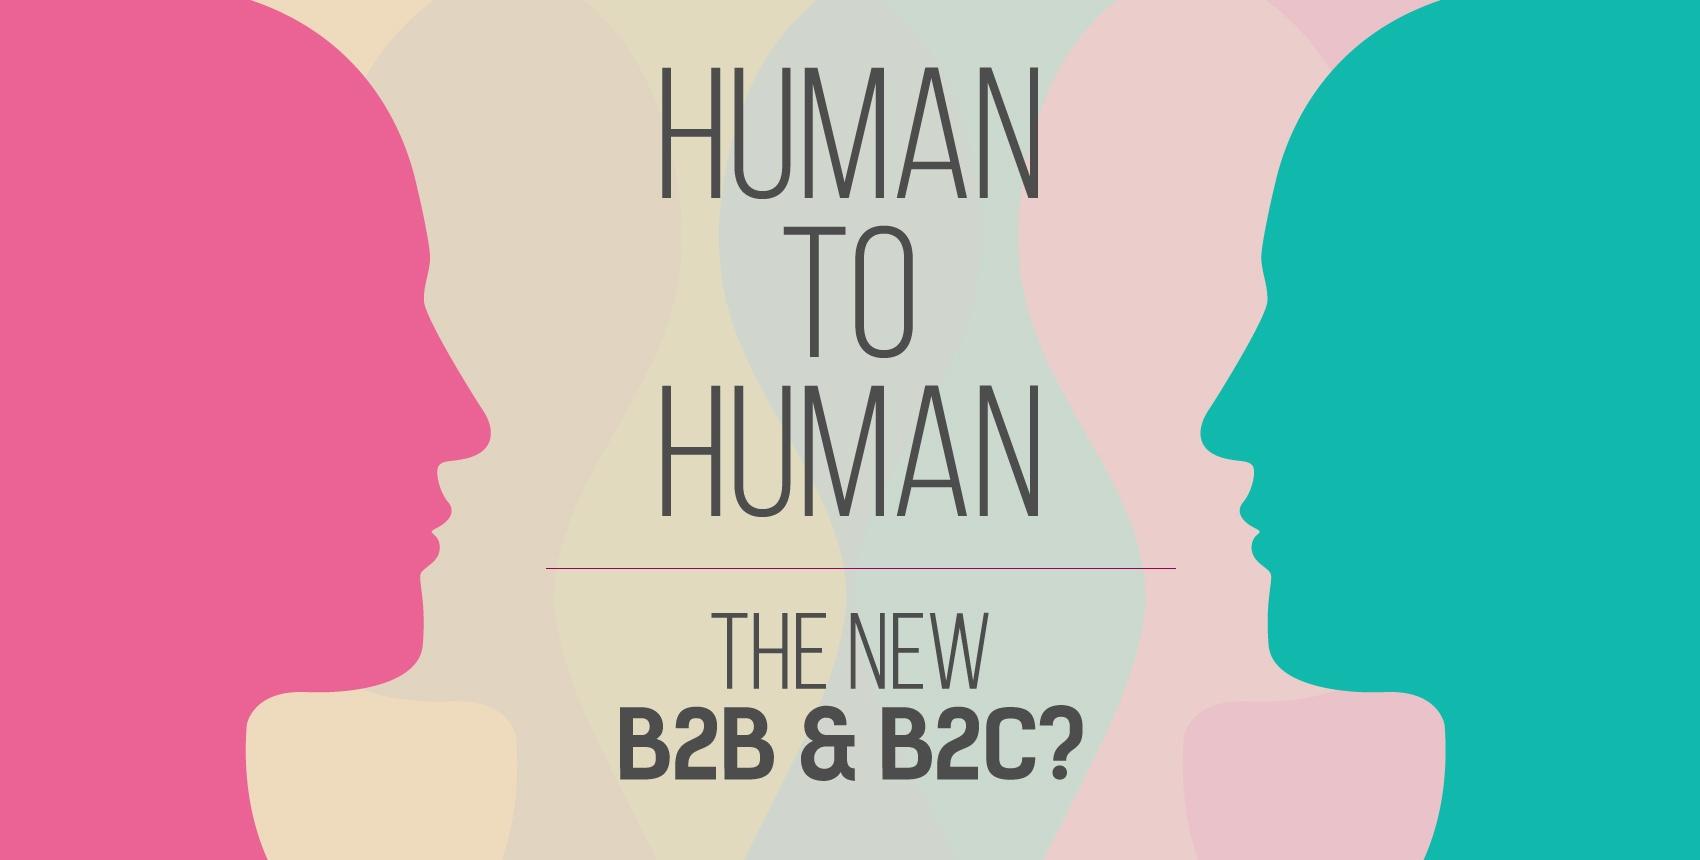 jbh-human-to-human-marketing-1